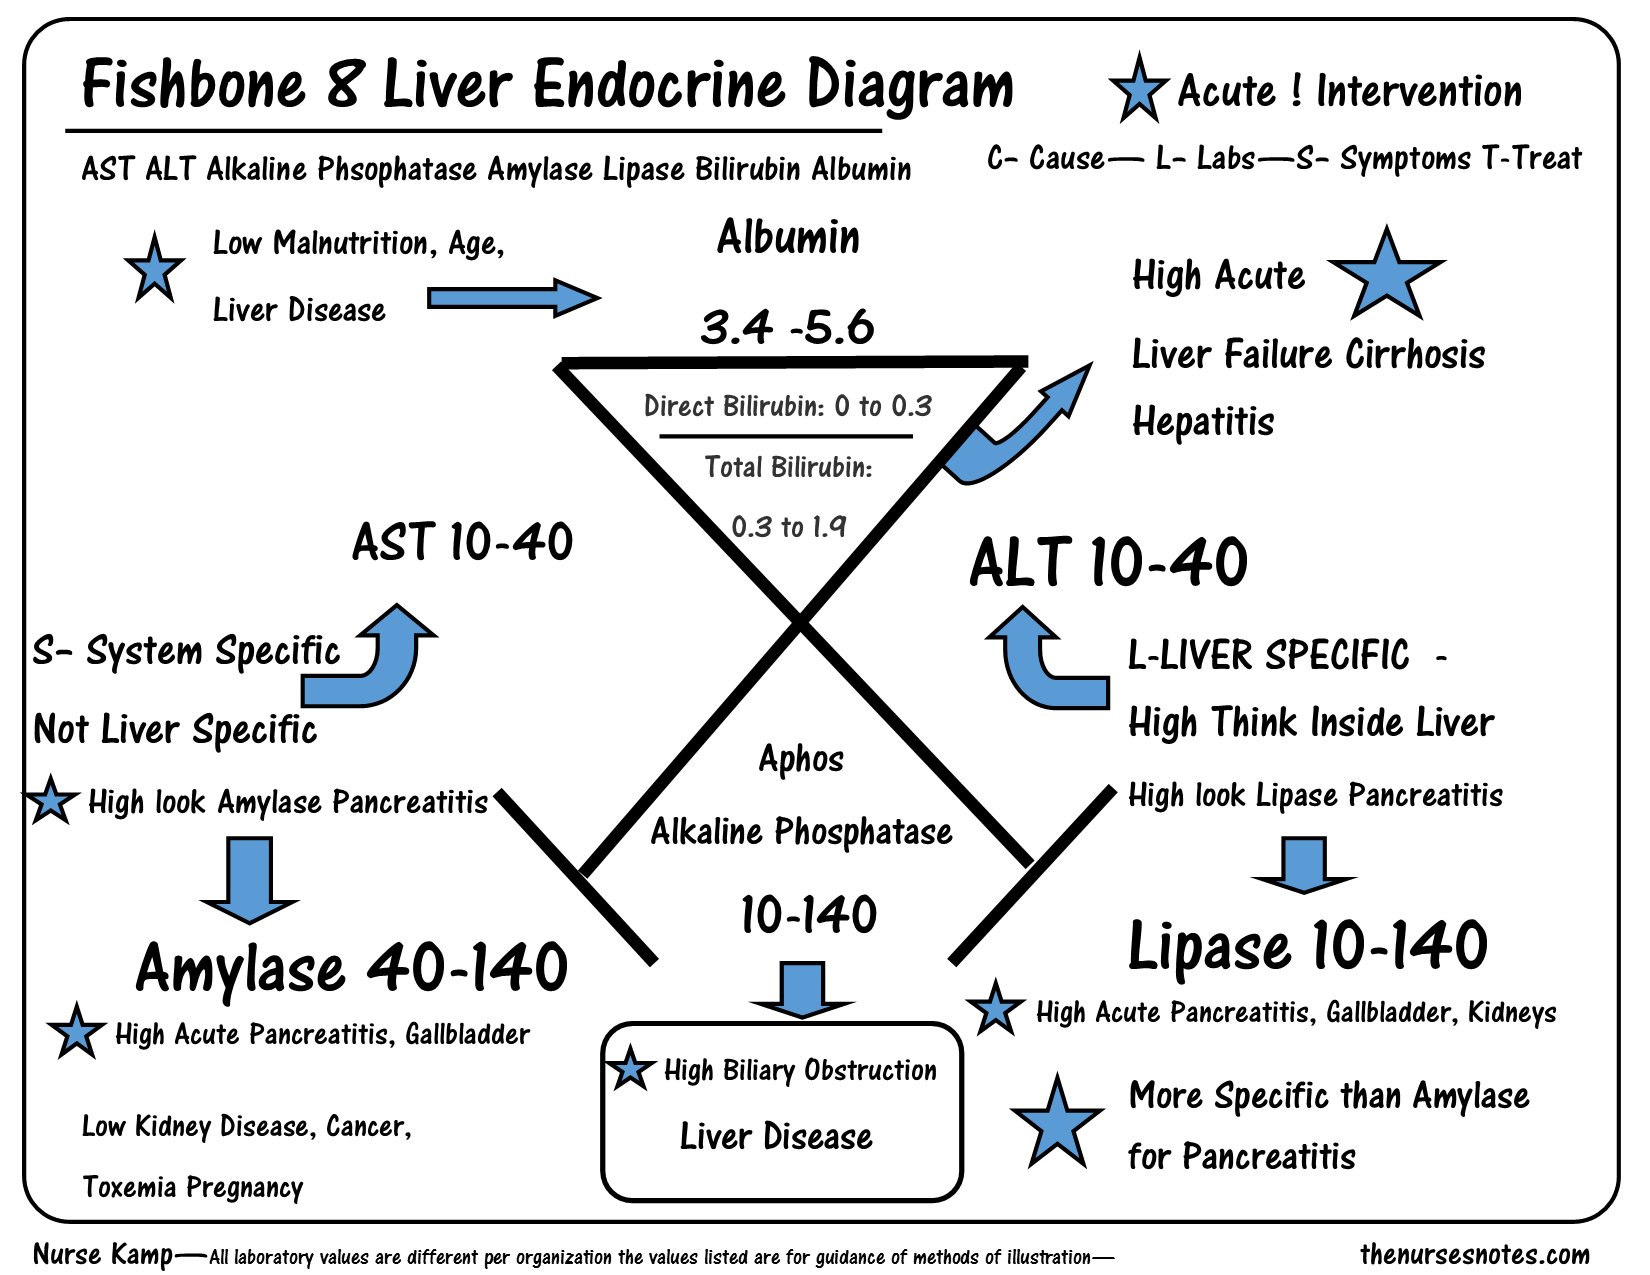 Medical Fishbone Diagram Lab Values | www.galleryhip.com - The Hippest ...